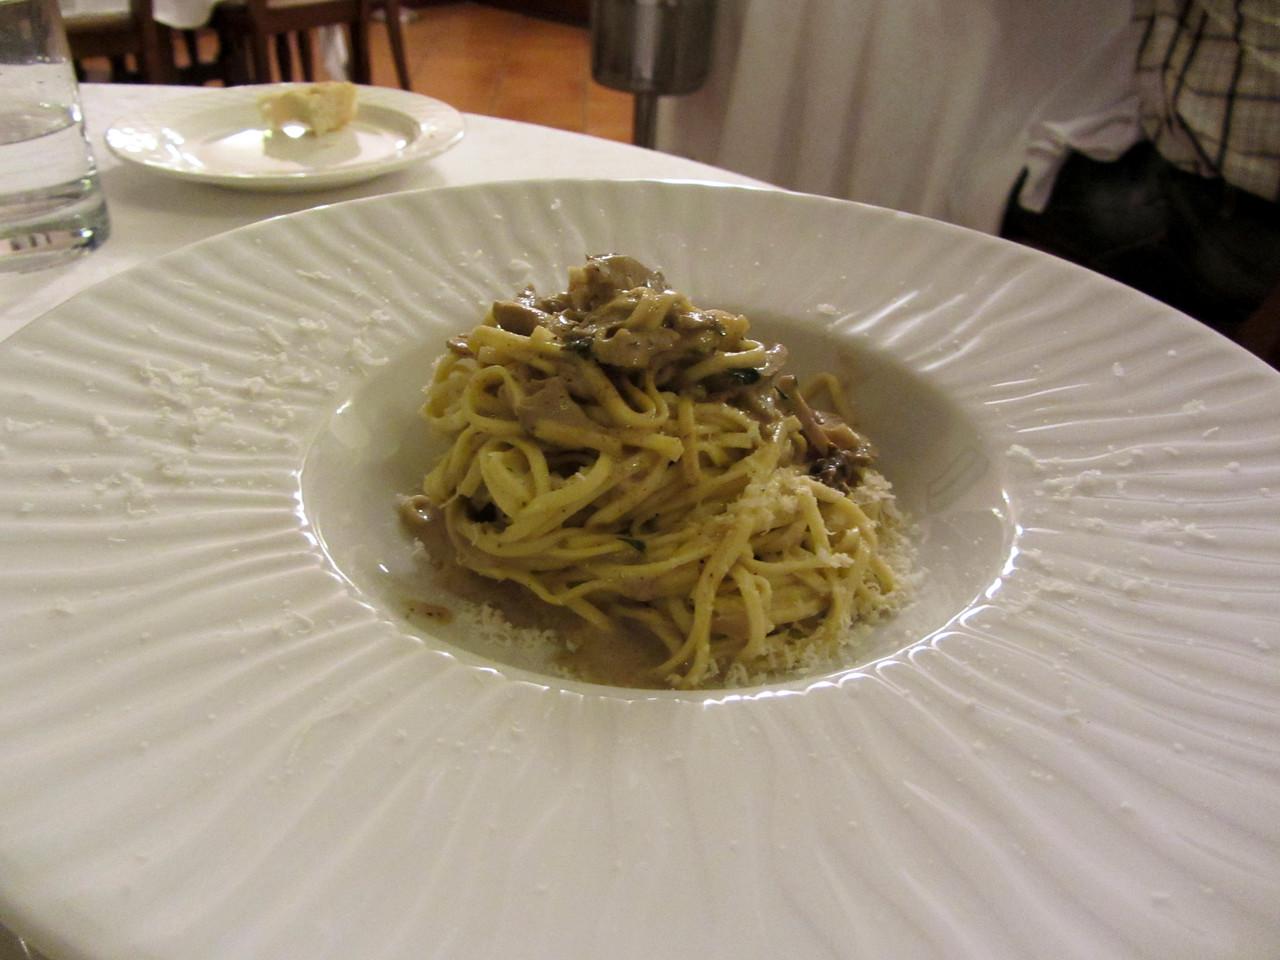 Tajarin with porcini mushrooms